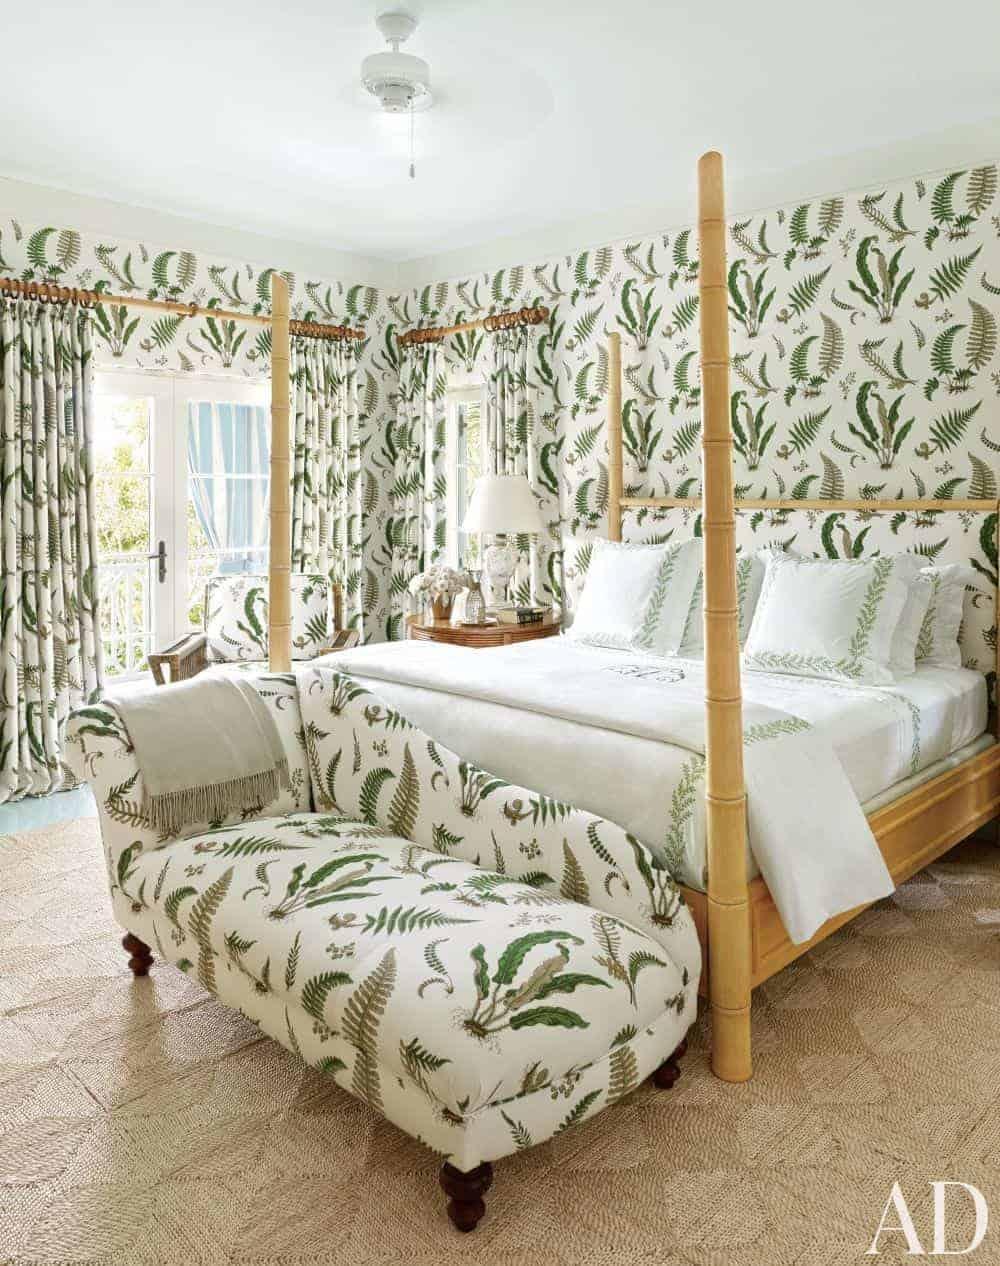 beach-bedroom-miles-redd-lyford-cay-bahamas-201308-3_1000-watermarked